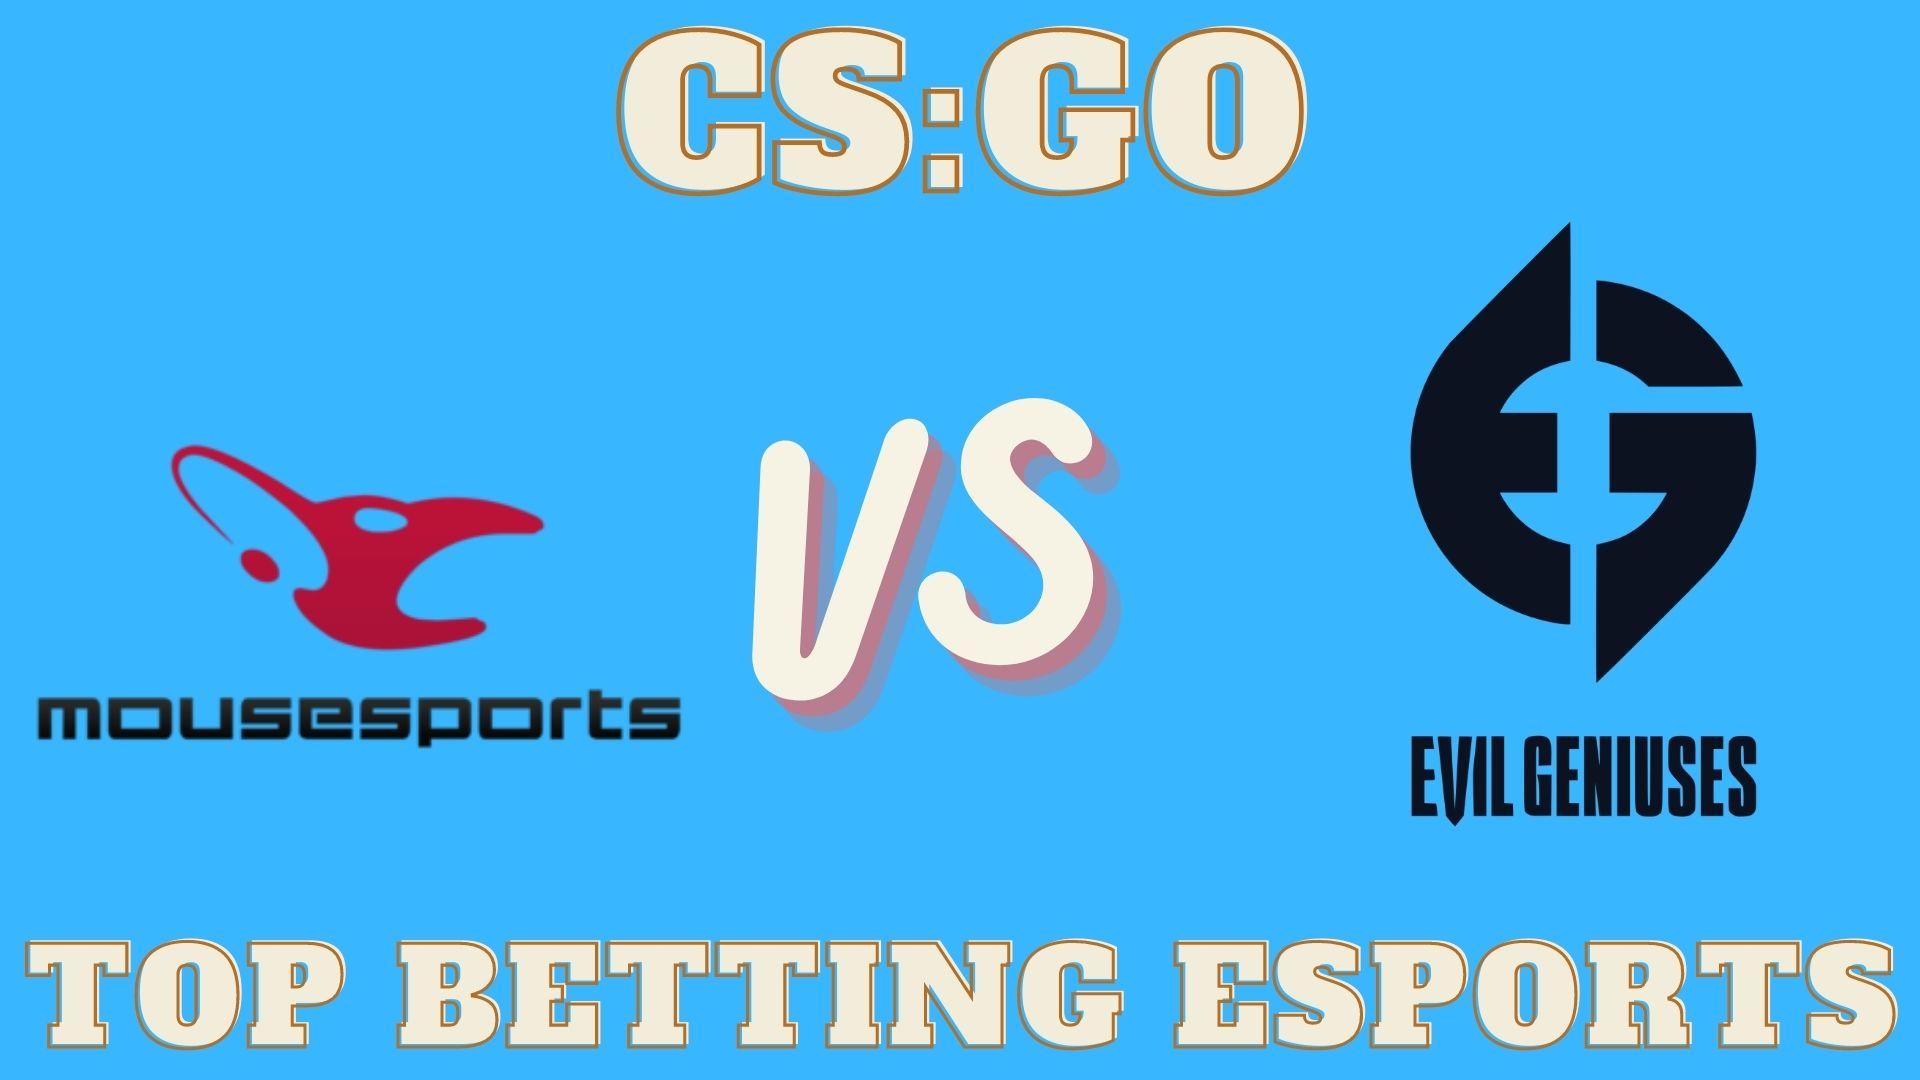 CS:GO Evil Geniuses vs mousesports